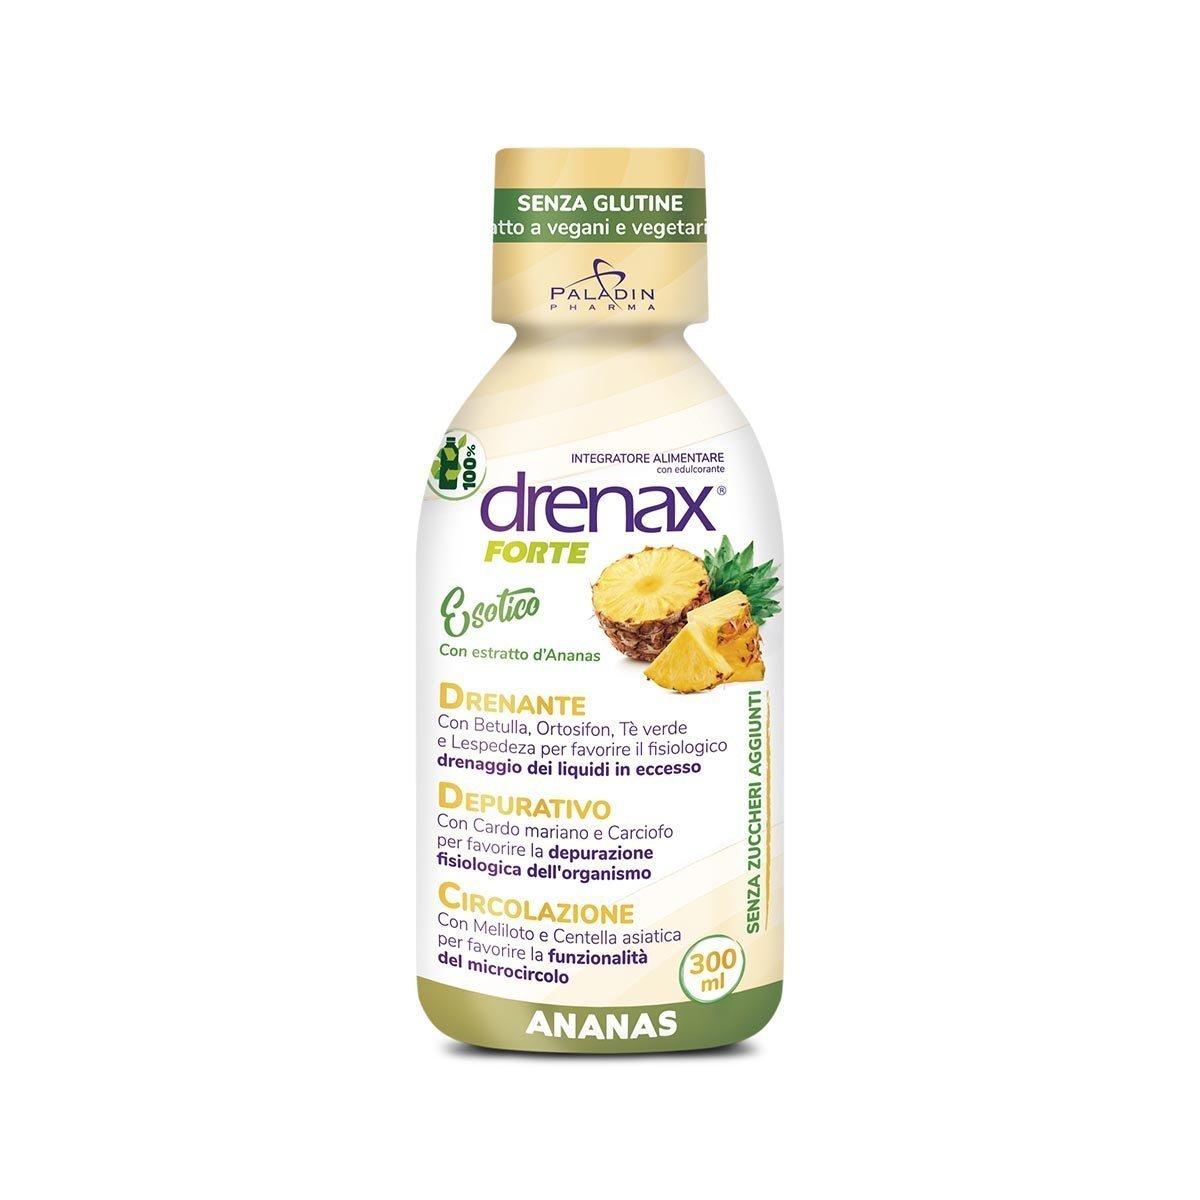 Drenax Forte Pocket Ananas